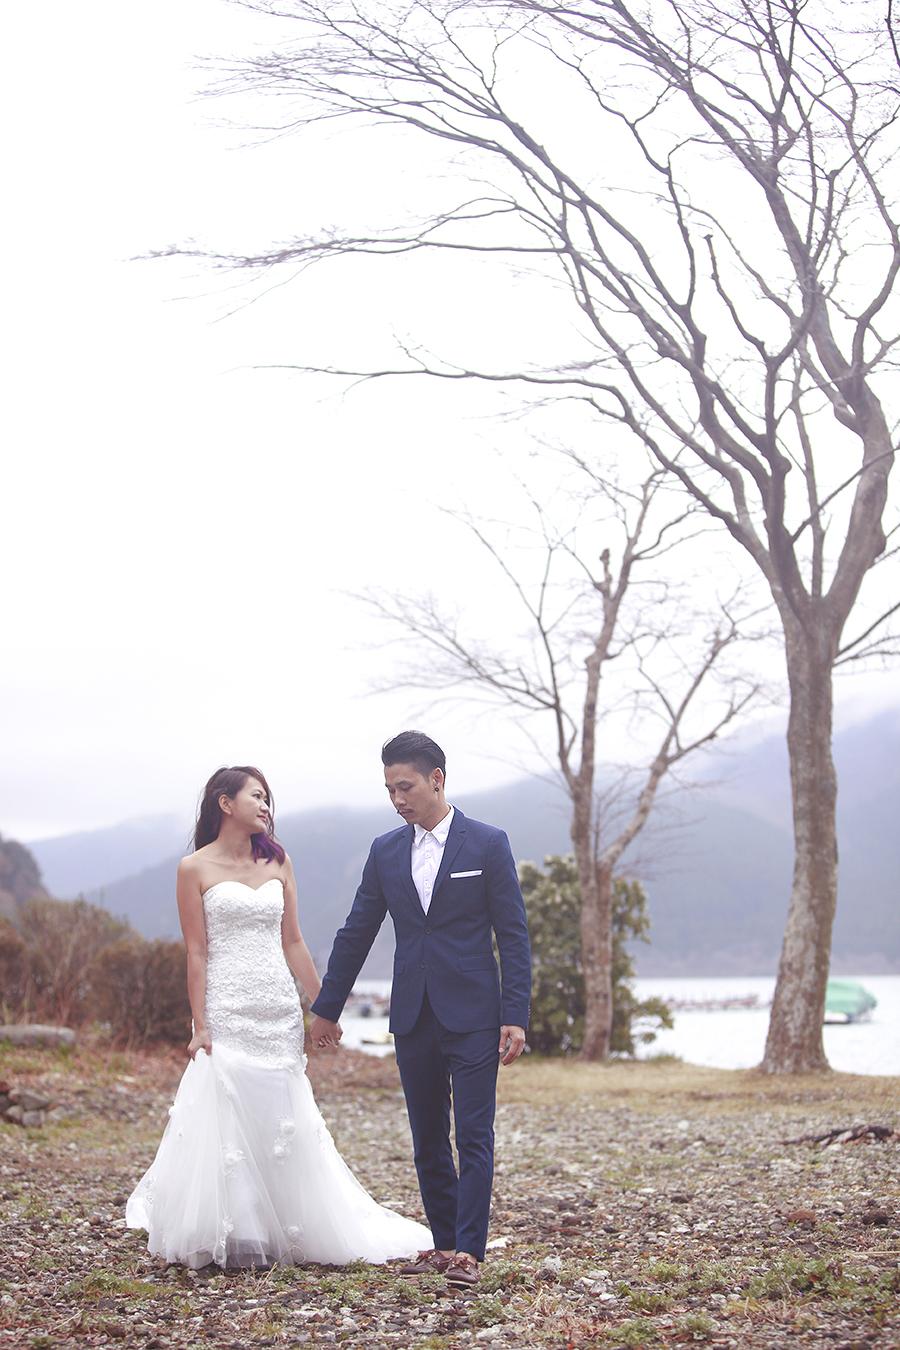 tokyo hakone japan spring sakura . engagement wedding photography by kurt ahs . ns + eu . 0384.jpg